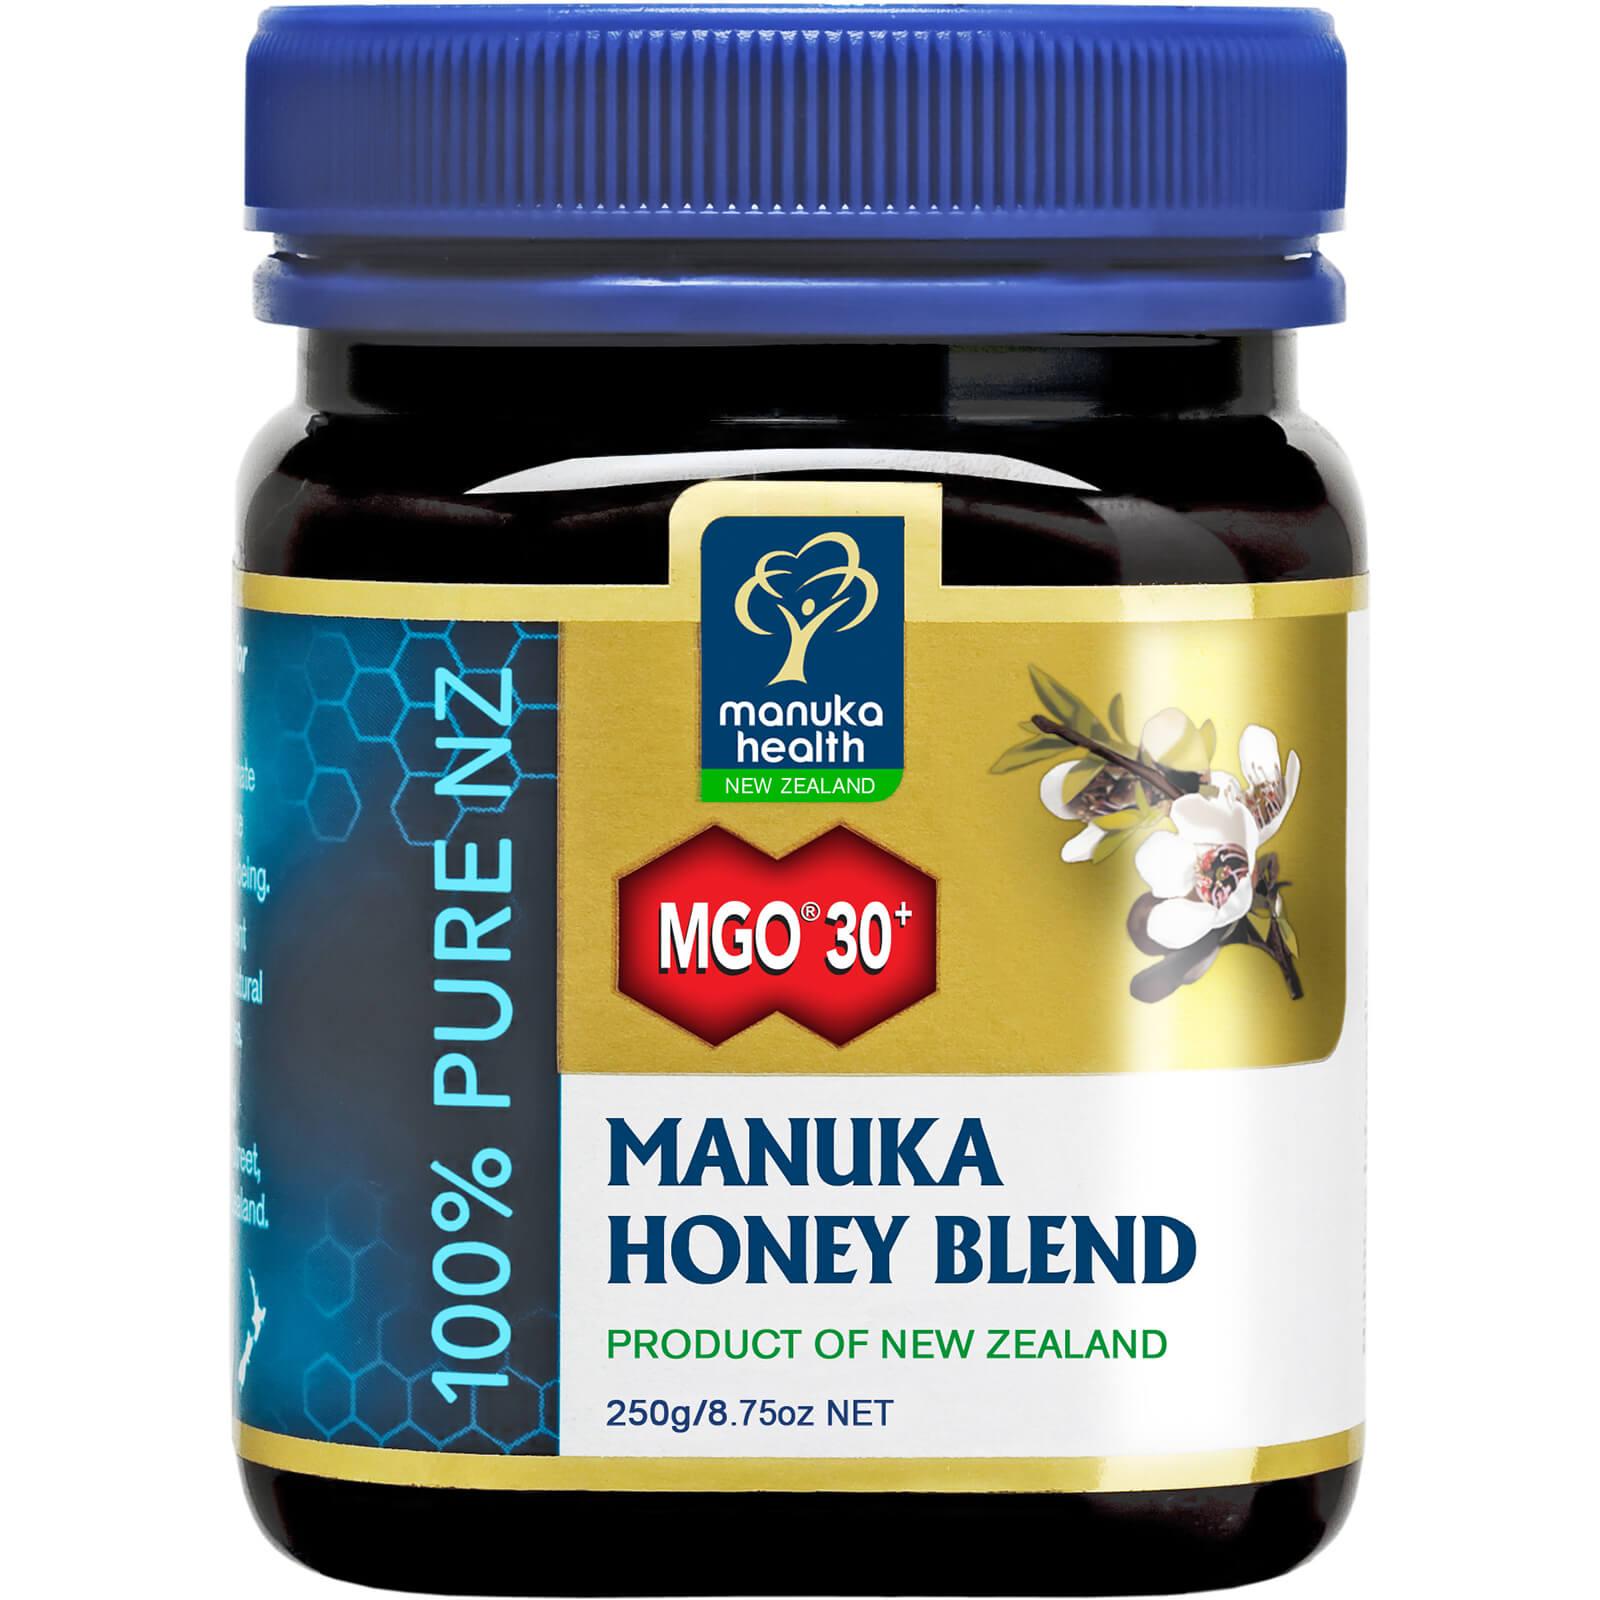 Manuka Health New Zealand Ltd MGO 30+ Manuka Honey Blend - 1000g